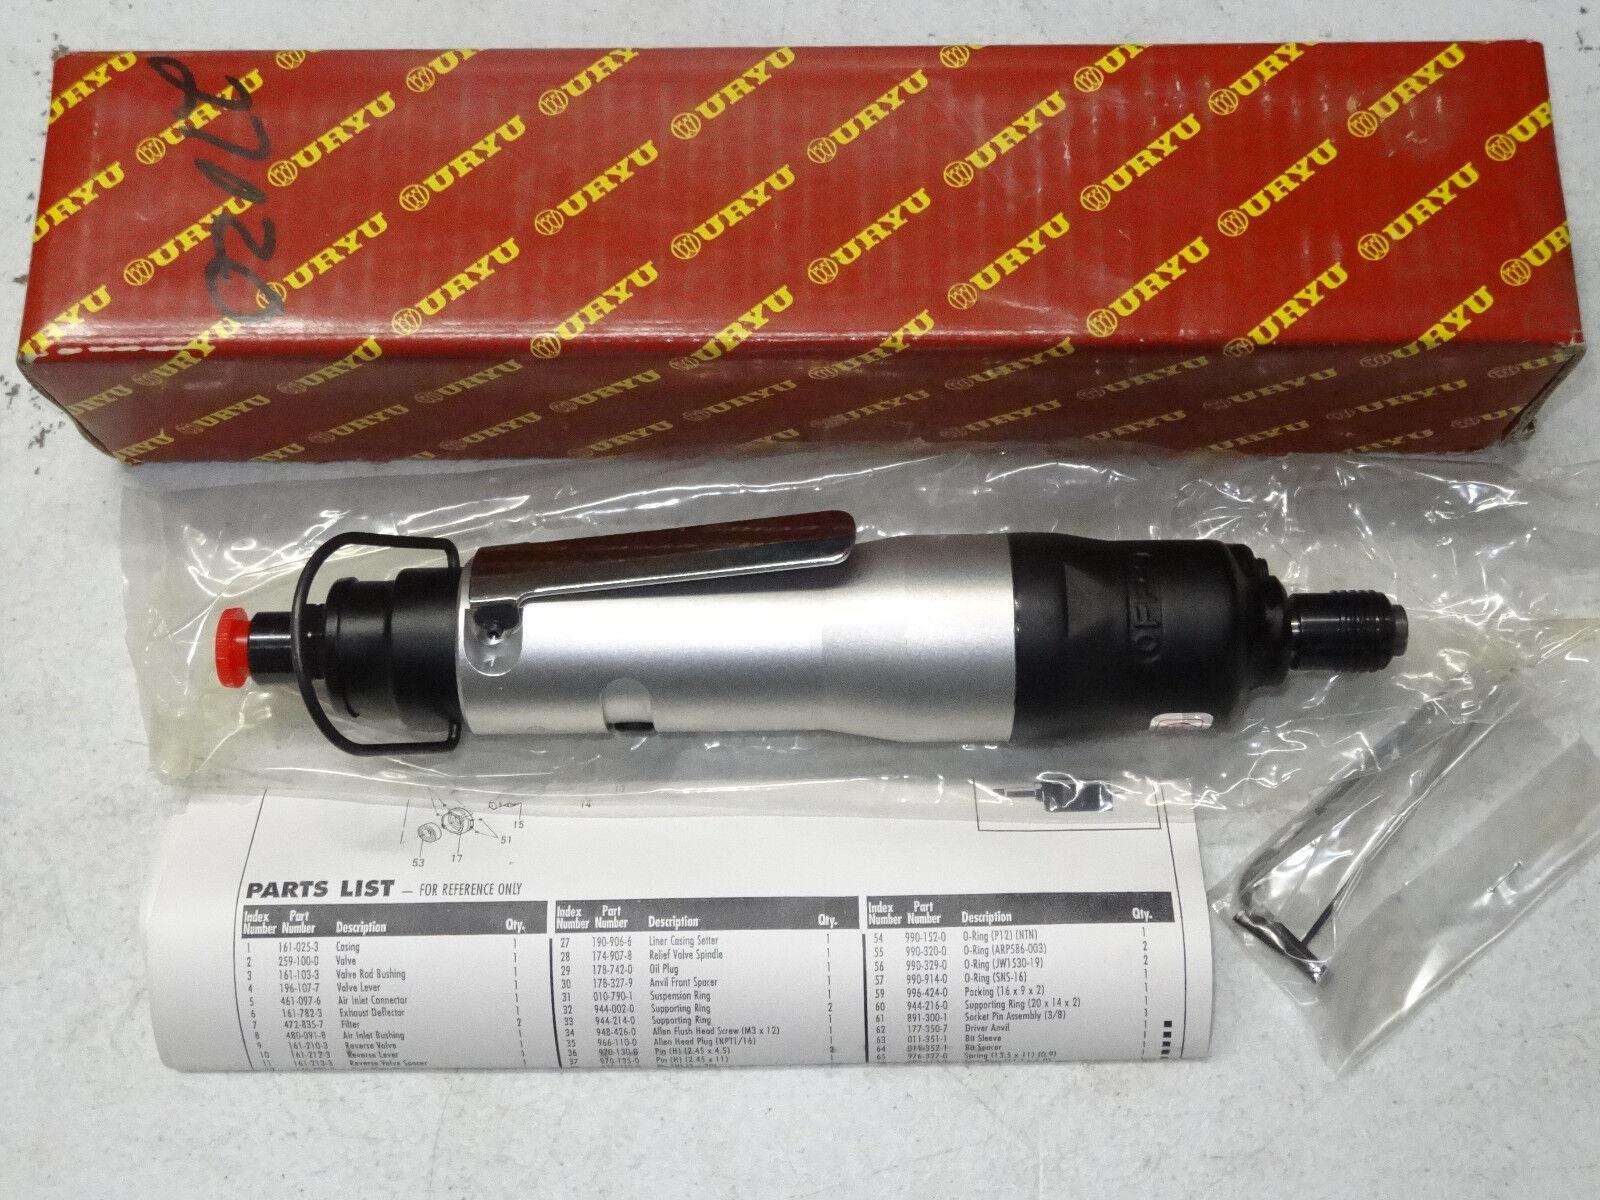 New AIMCO Uryu Alpha-45SD Acra-Pulse Screwdriver Air Pneumatic Tool 1/4